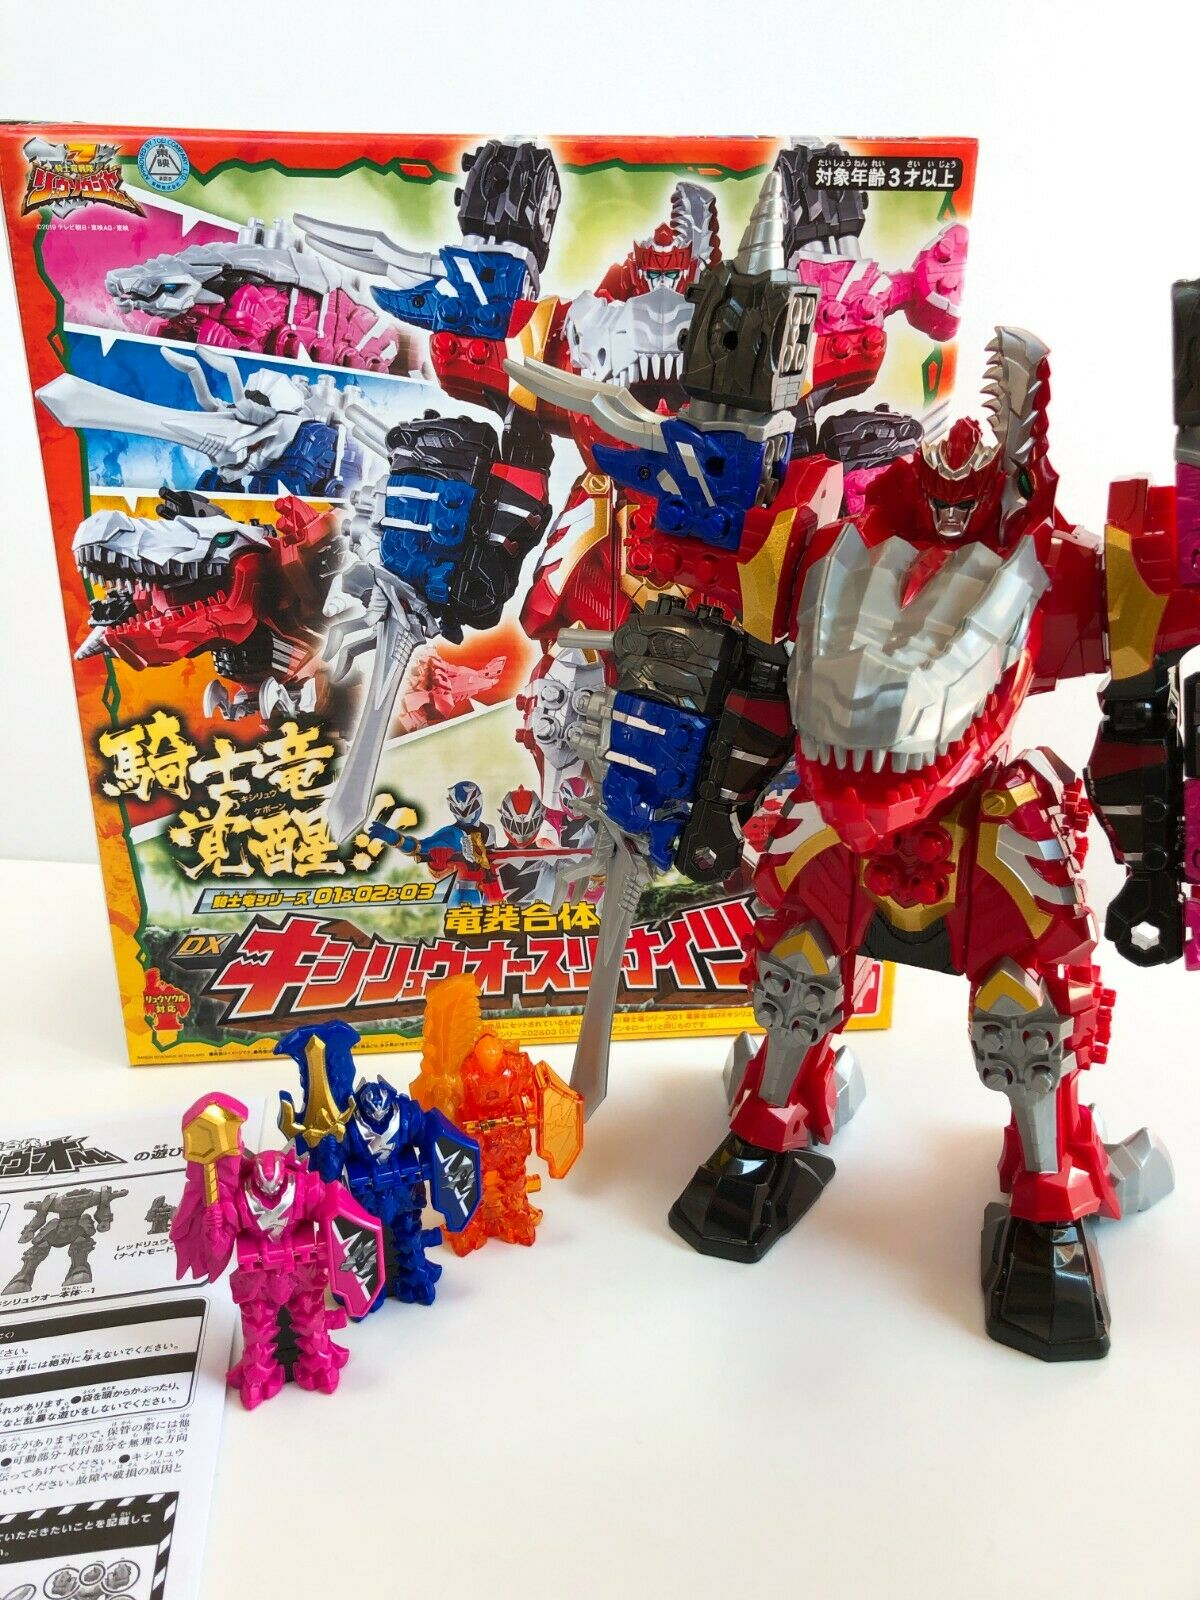 Nuevo Power Ranger ryusouger DX kishiryuoh 3 noches Set y Limitd ryusoul Japan F S